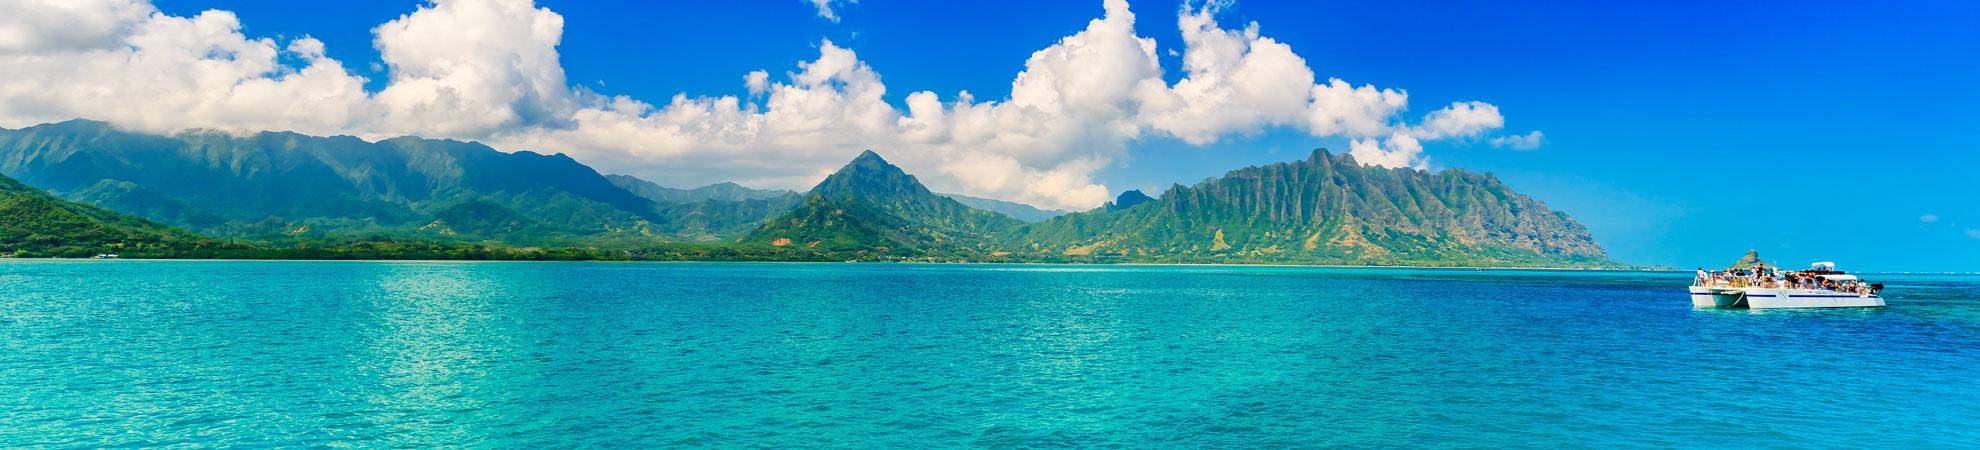 Les transports en commun en Polynésie